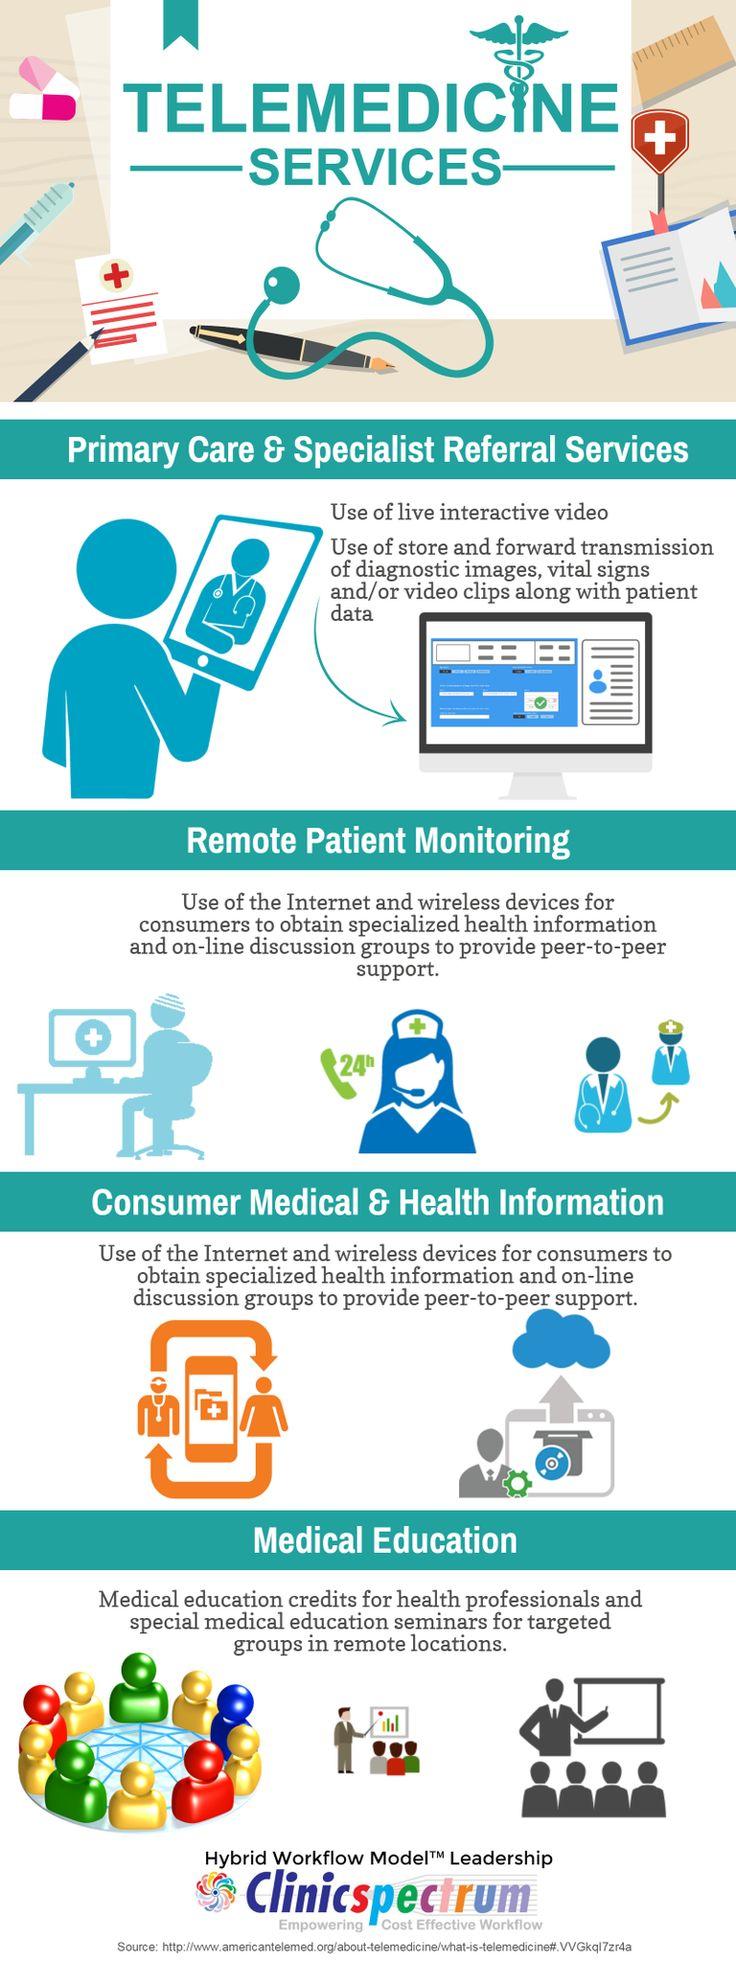 #Telemedicine Services an Infographics by @ClinicSpectrum @telehelp #HITsm